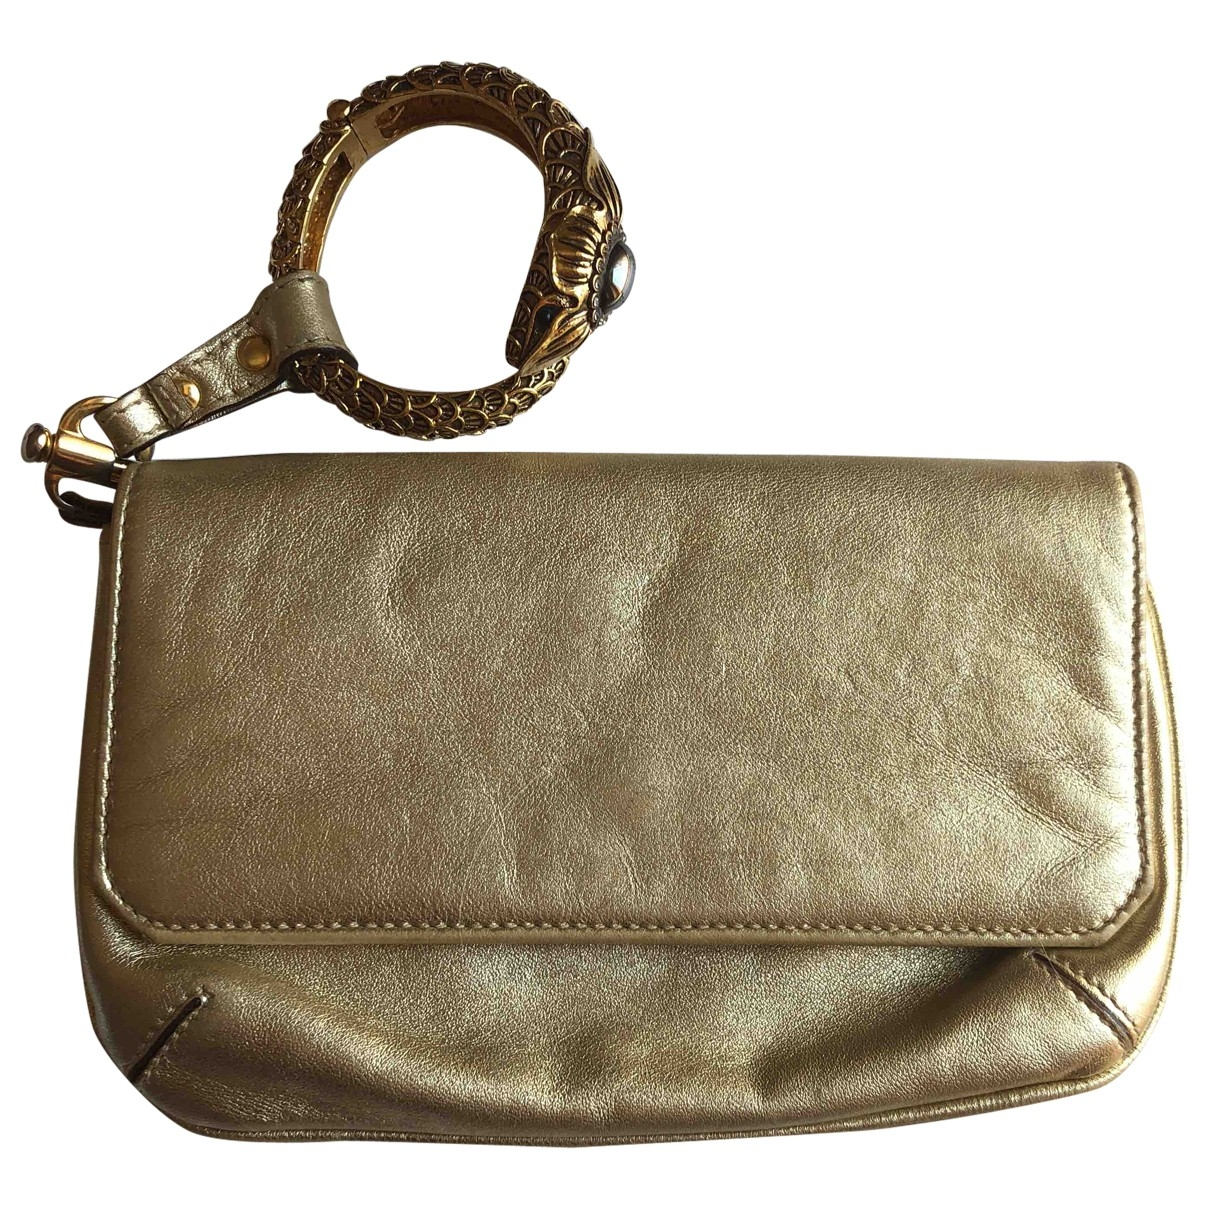 Roberto Cavalli \N Gold Leather Clutch bag for Women \N